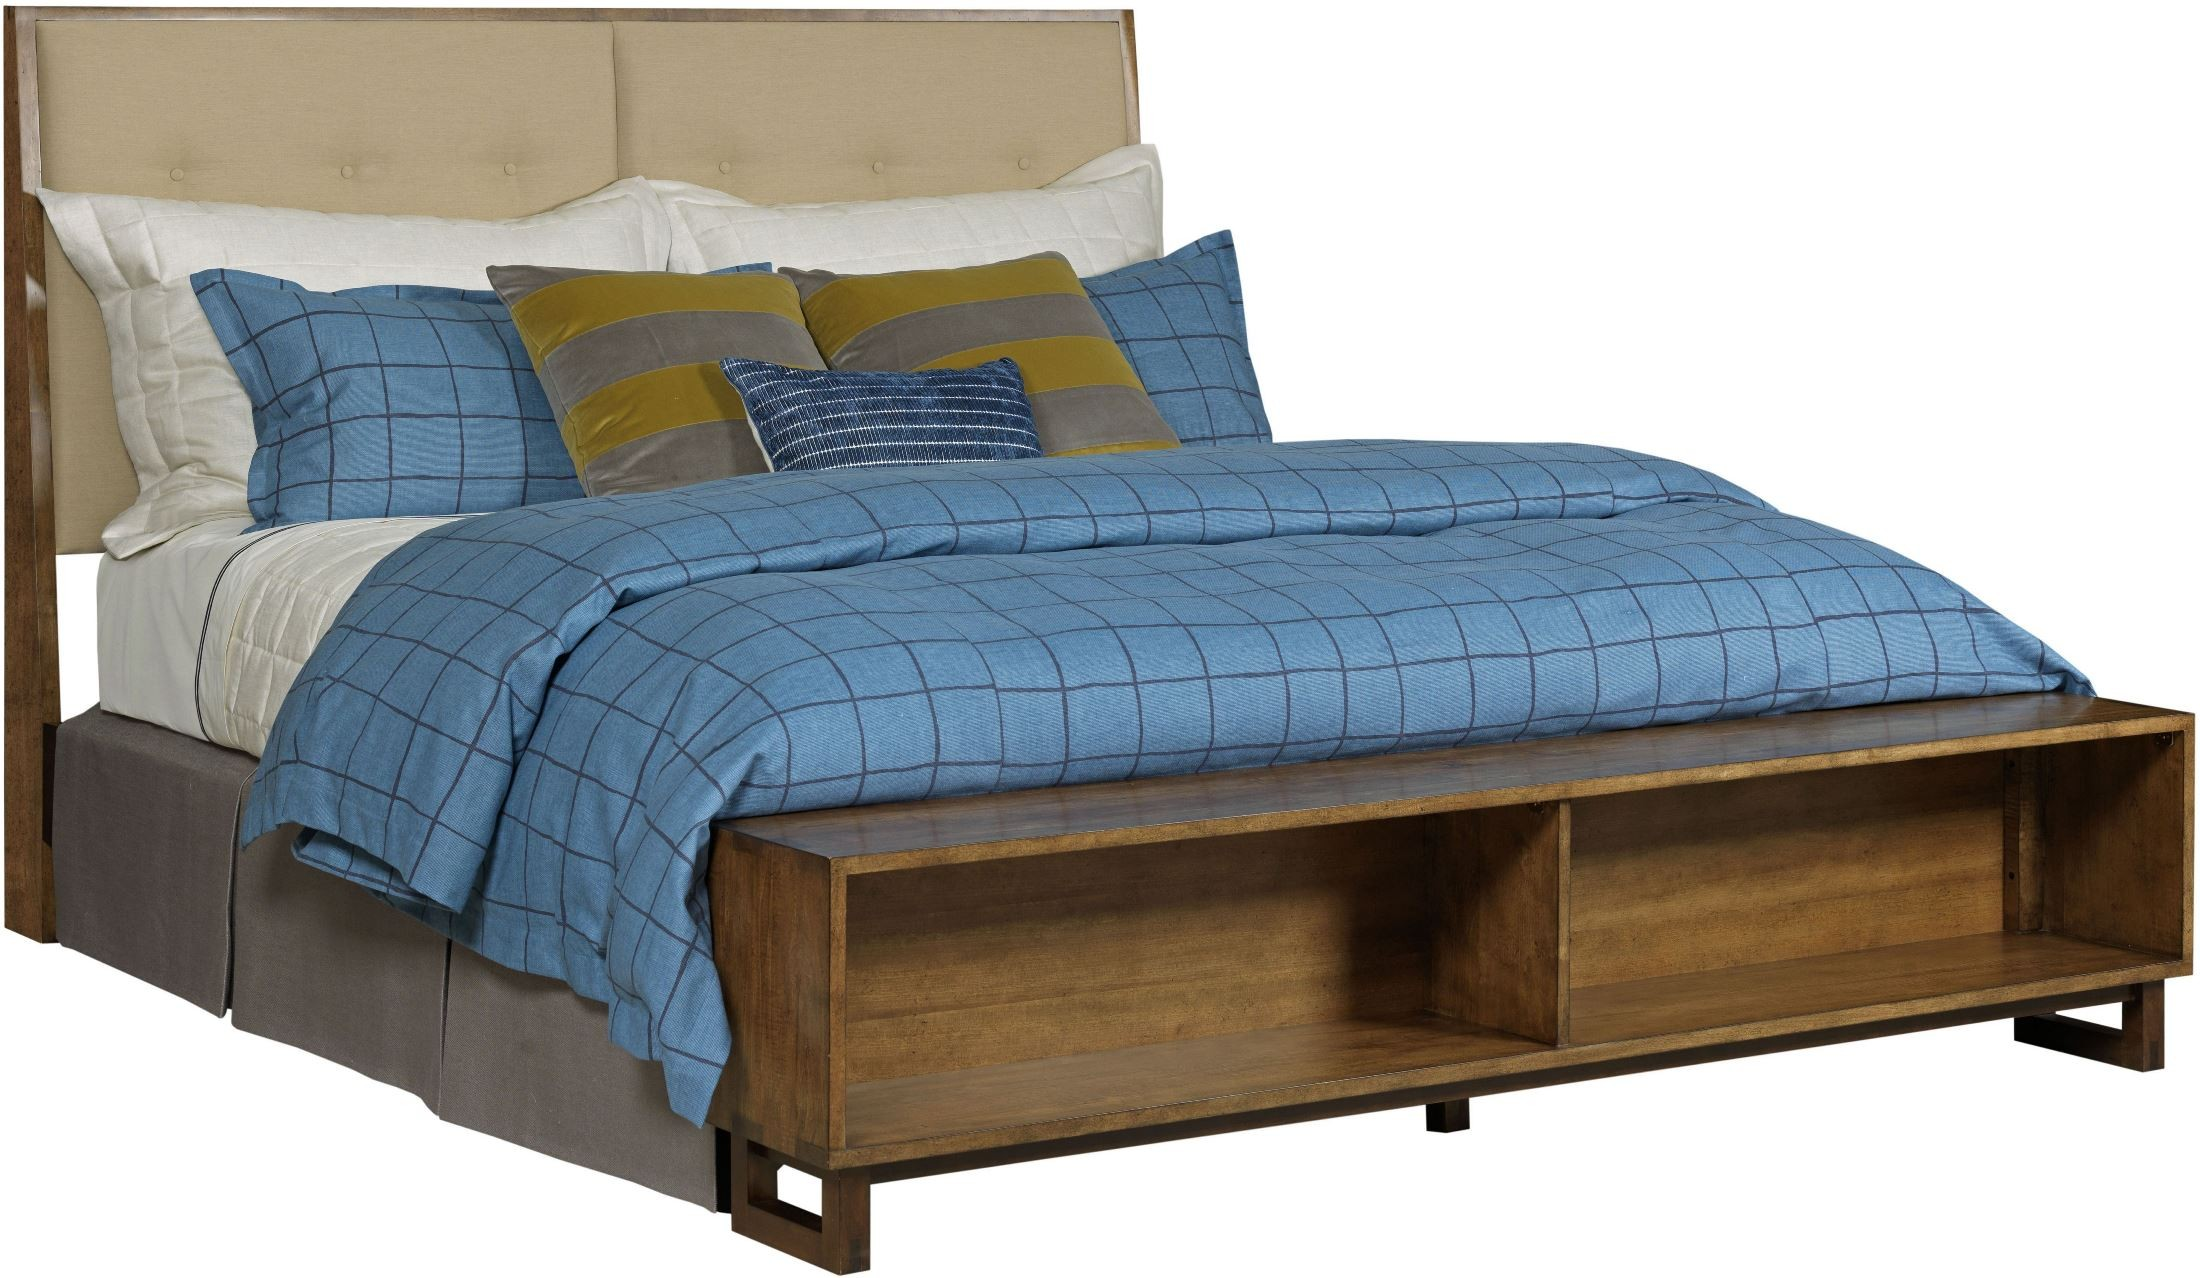 Traverse brown patternmaker cal king upholstered storage - California king storage bedroom sets ...